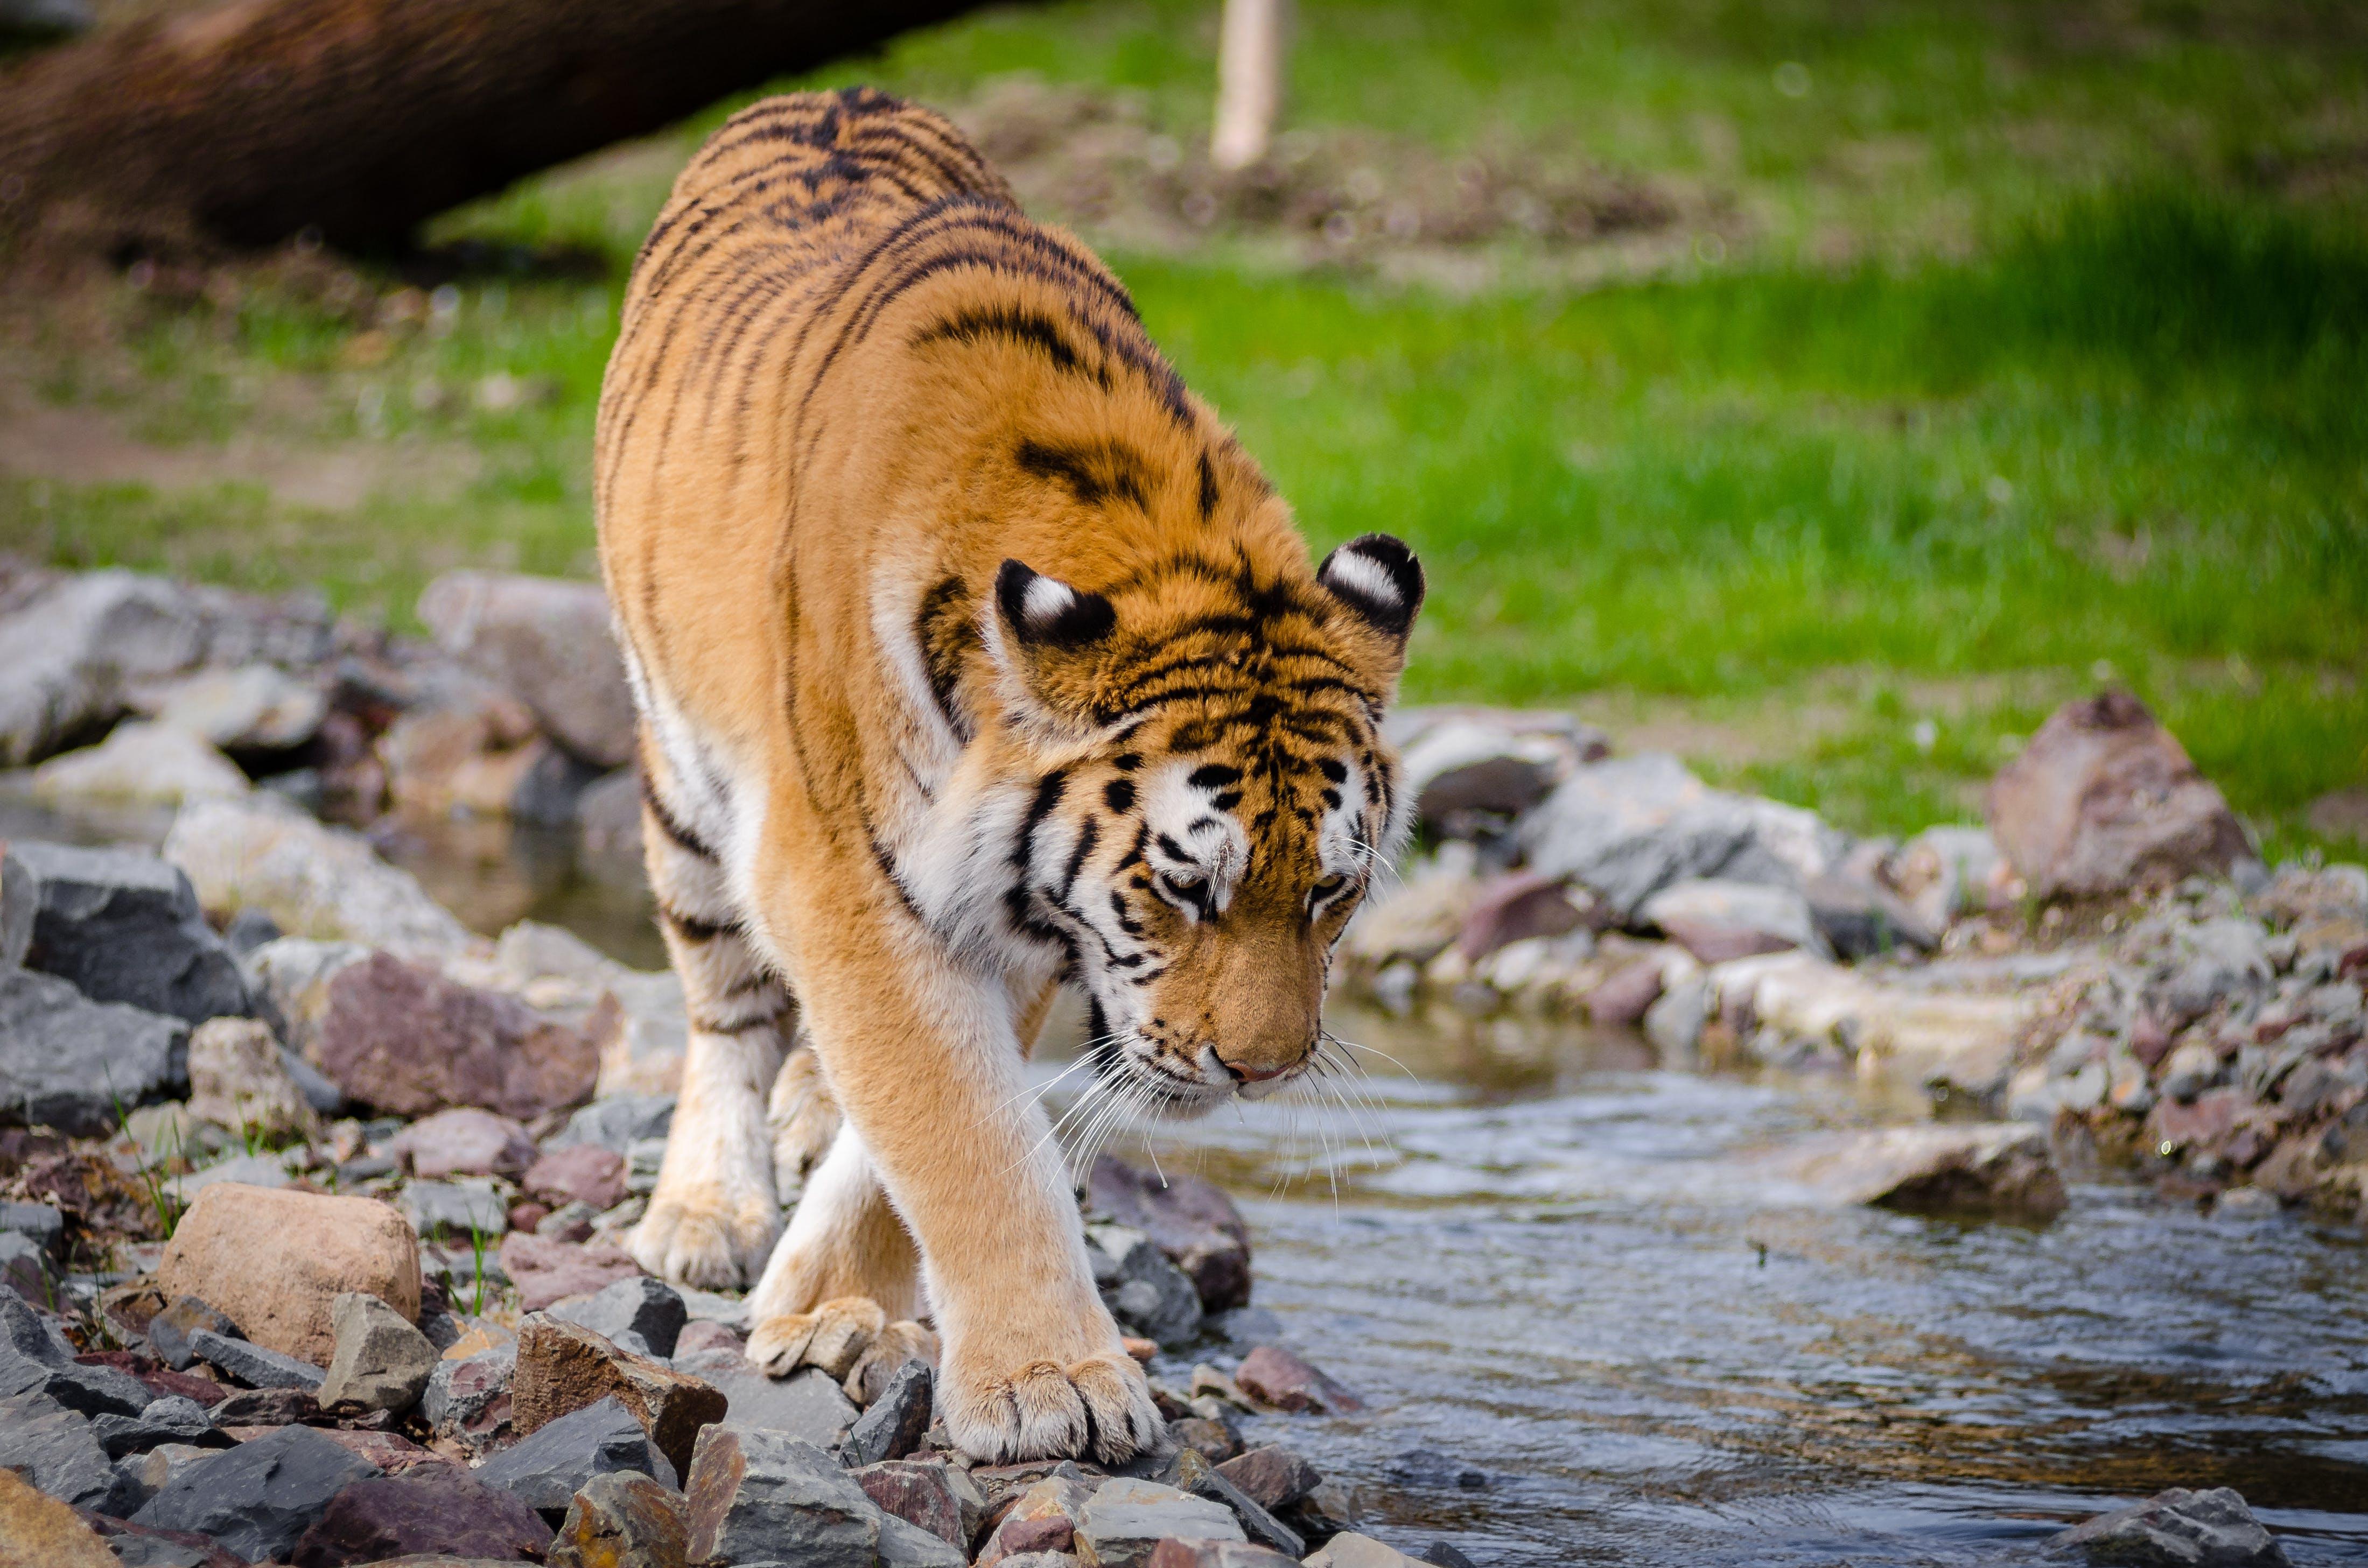 Tiger Near River at Daytime